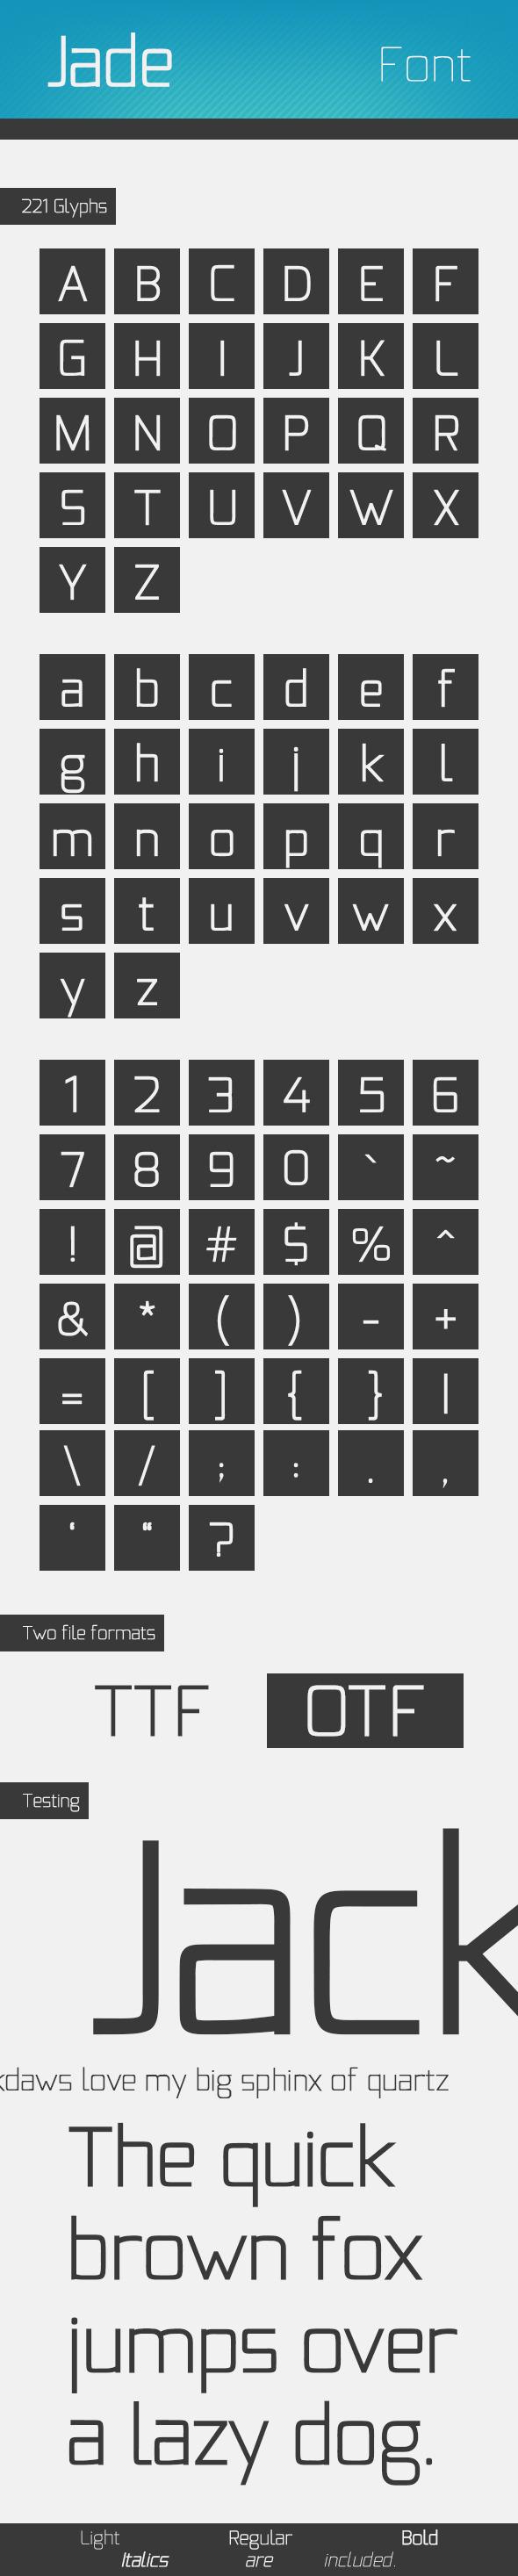 Jade Font Family - Sans-Serif Fonts